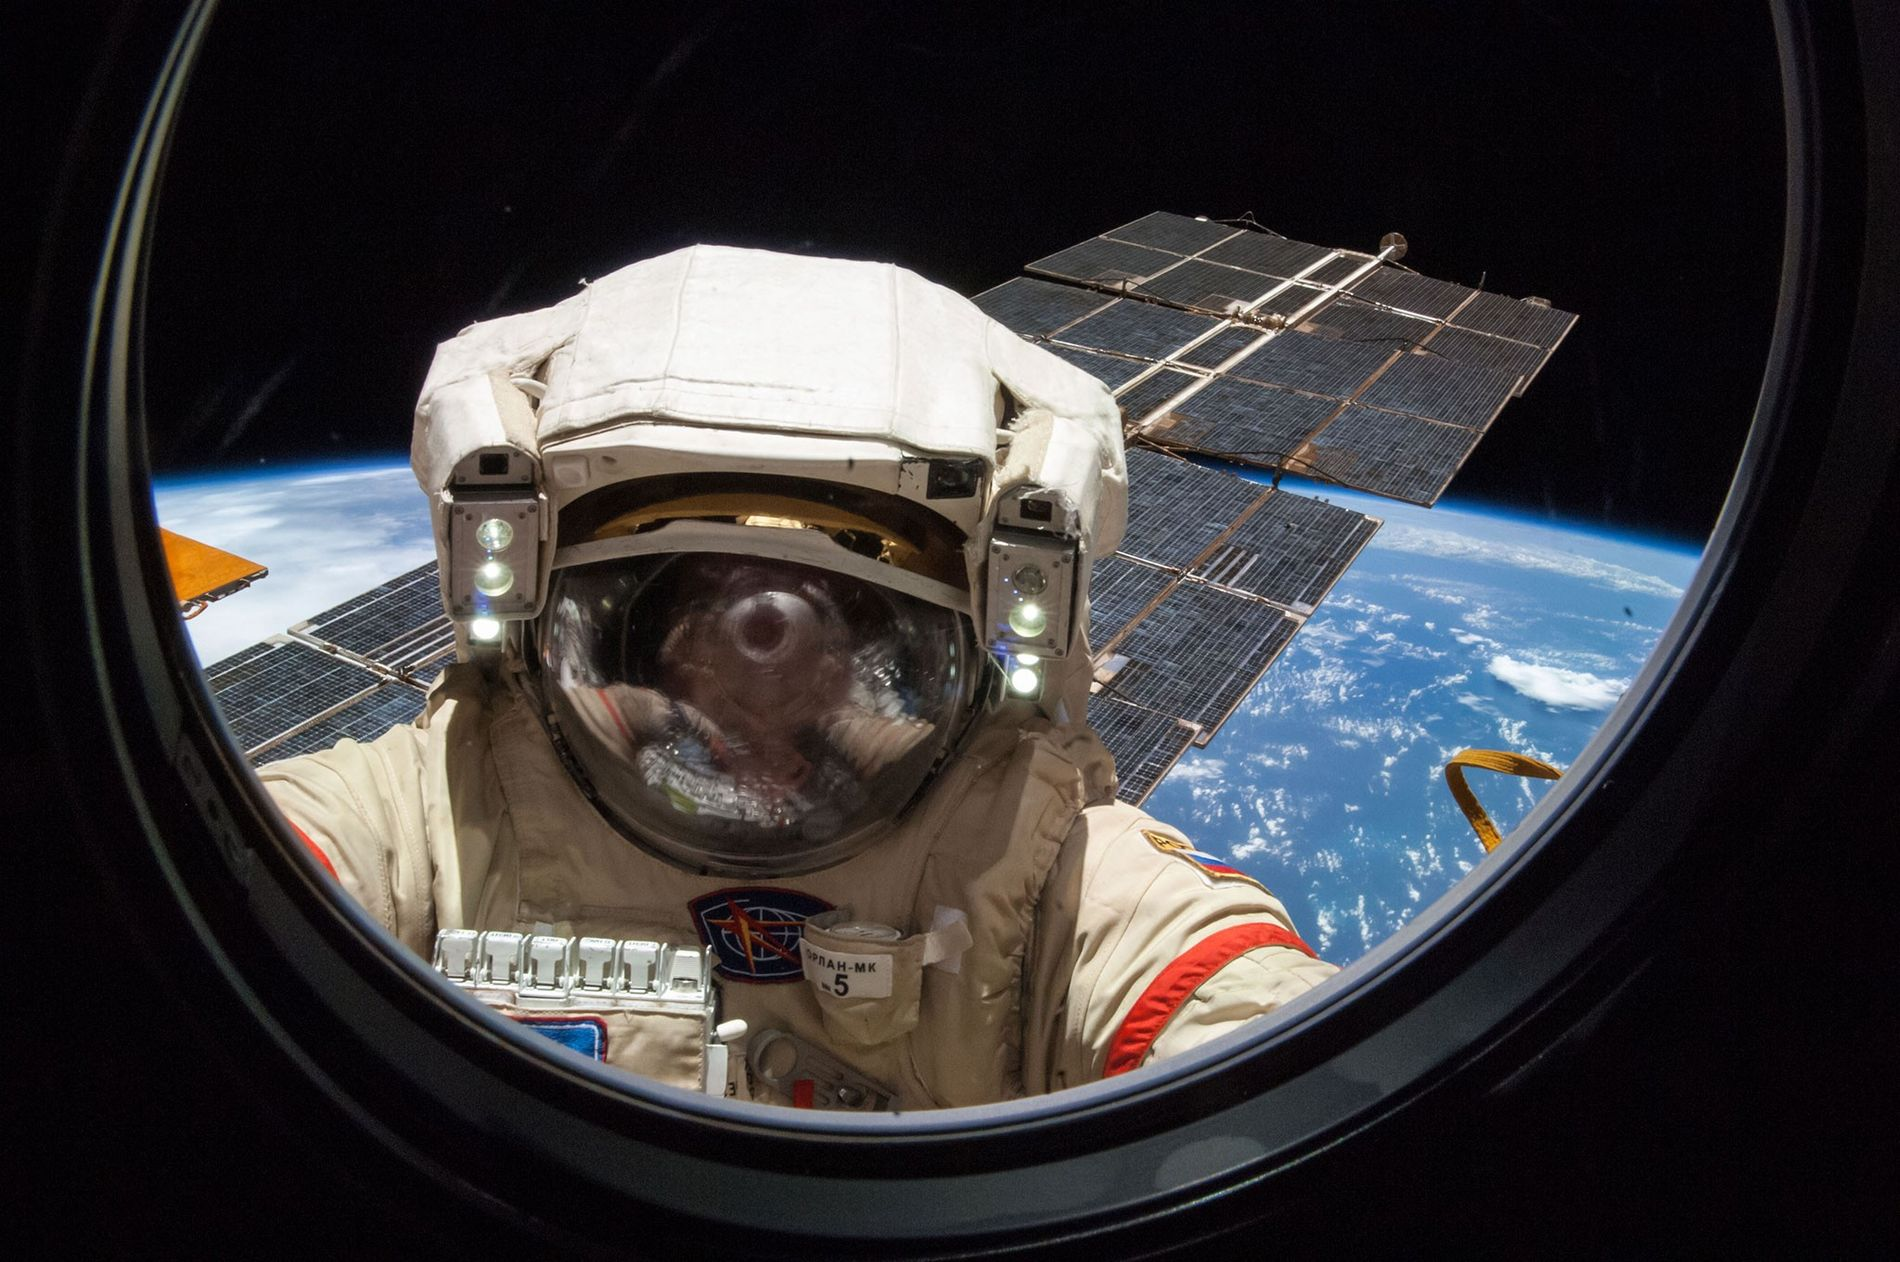 Kosmonaut Alexander Skworzow